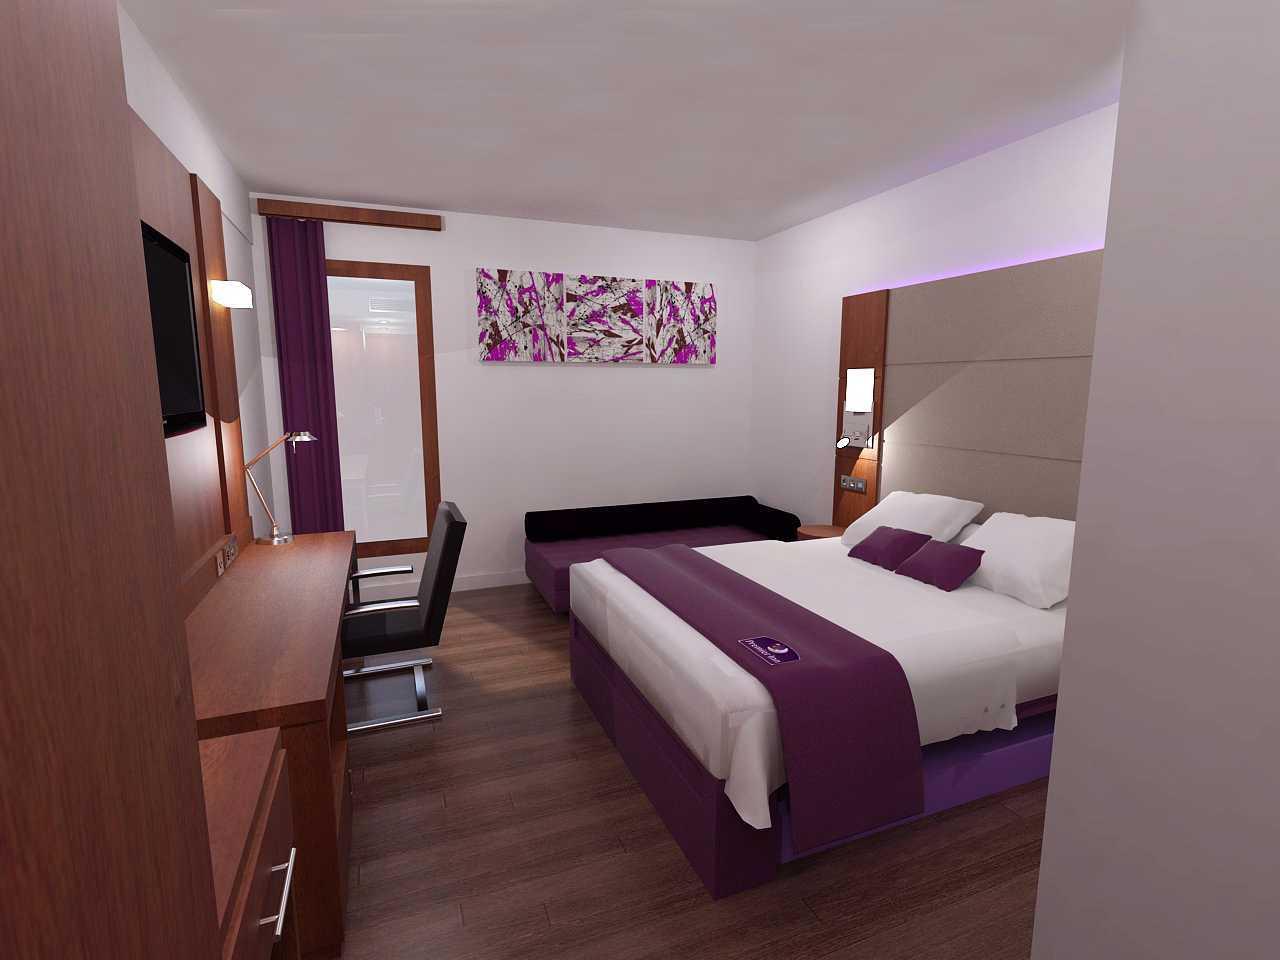 Limpad Sudibyo Premier Inn Hotel Jimbaran, Bali Jimbaran, Bali Room-4   27078